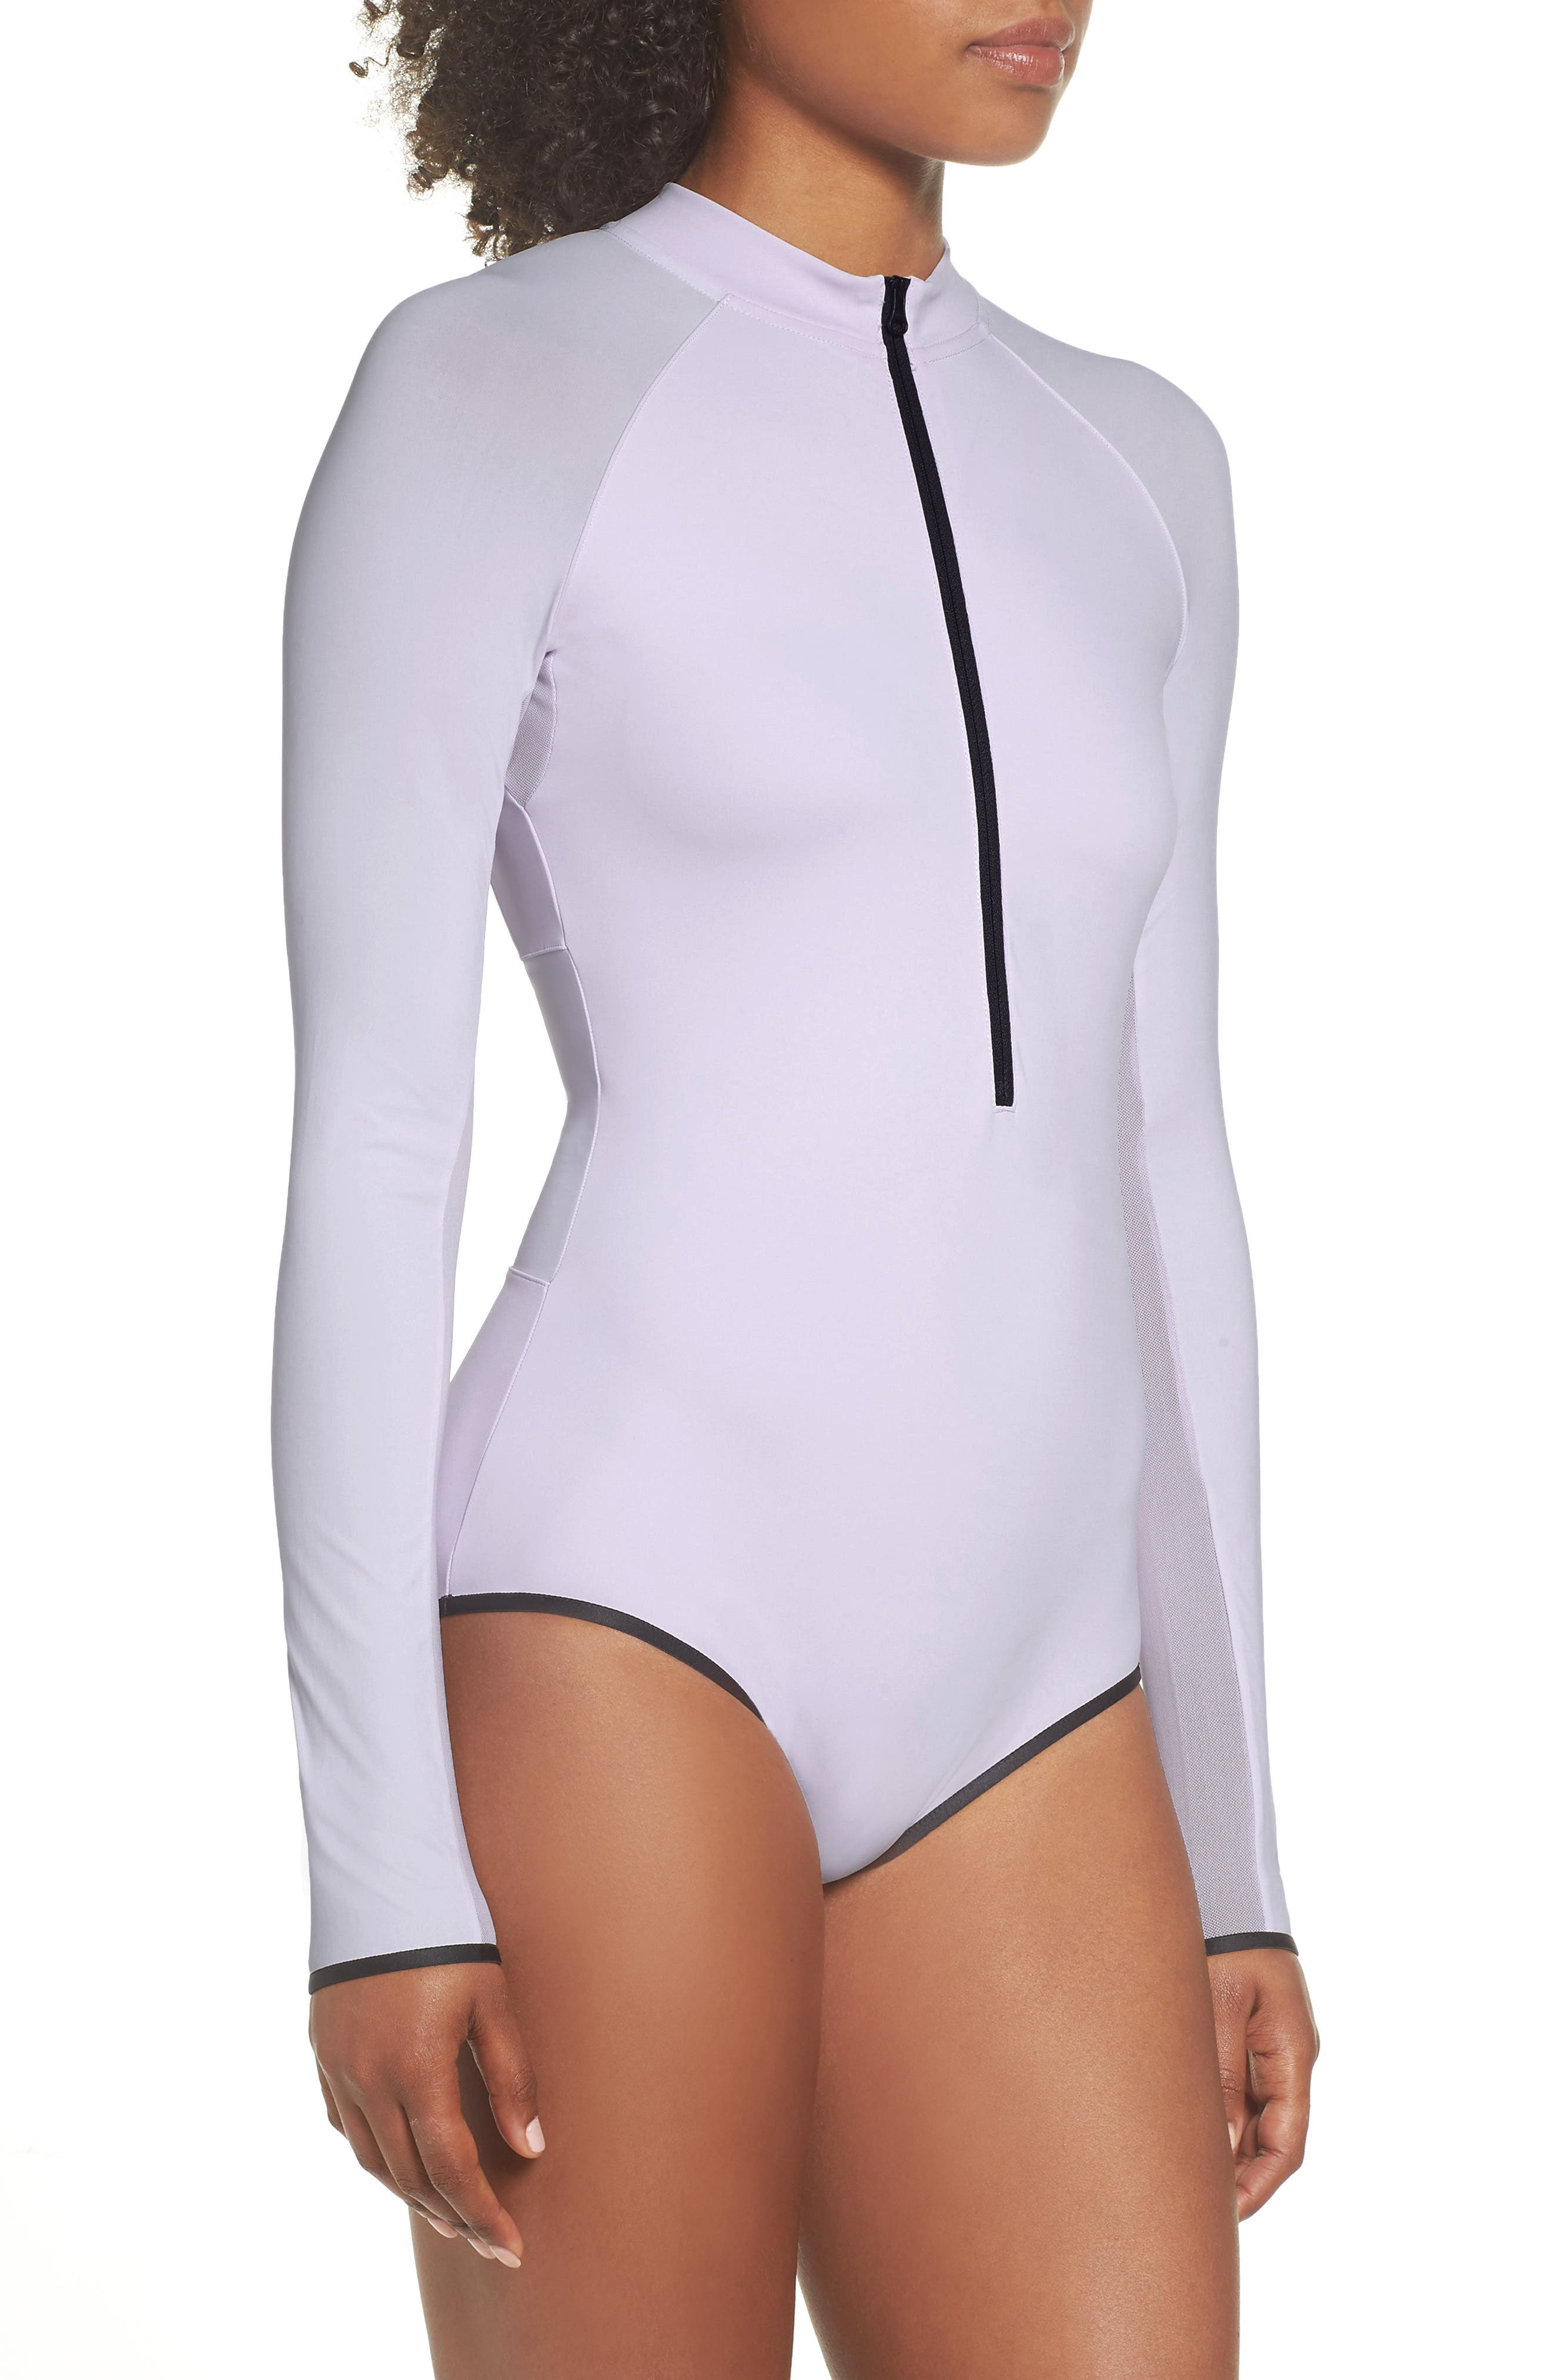 NRG Women's Dri-FIT Long Sleeve Bodysuit,                             Alternate thumbnail 3, color,                             Barely Grape/ Barely Grape